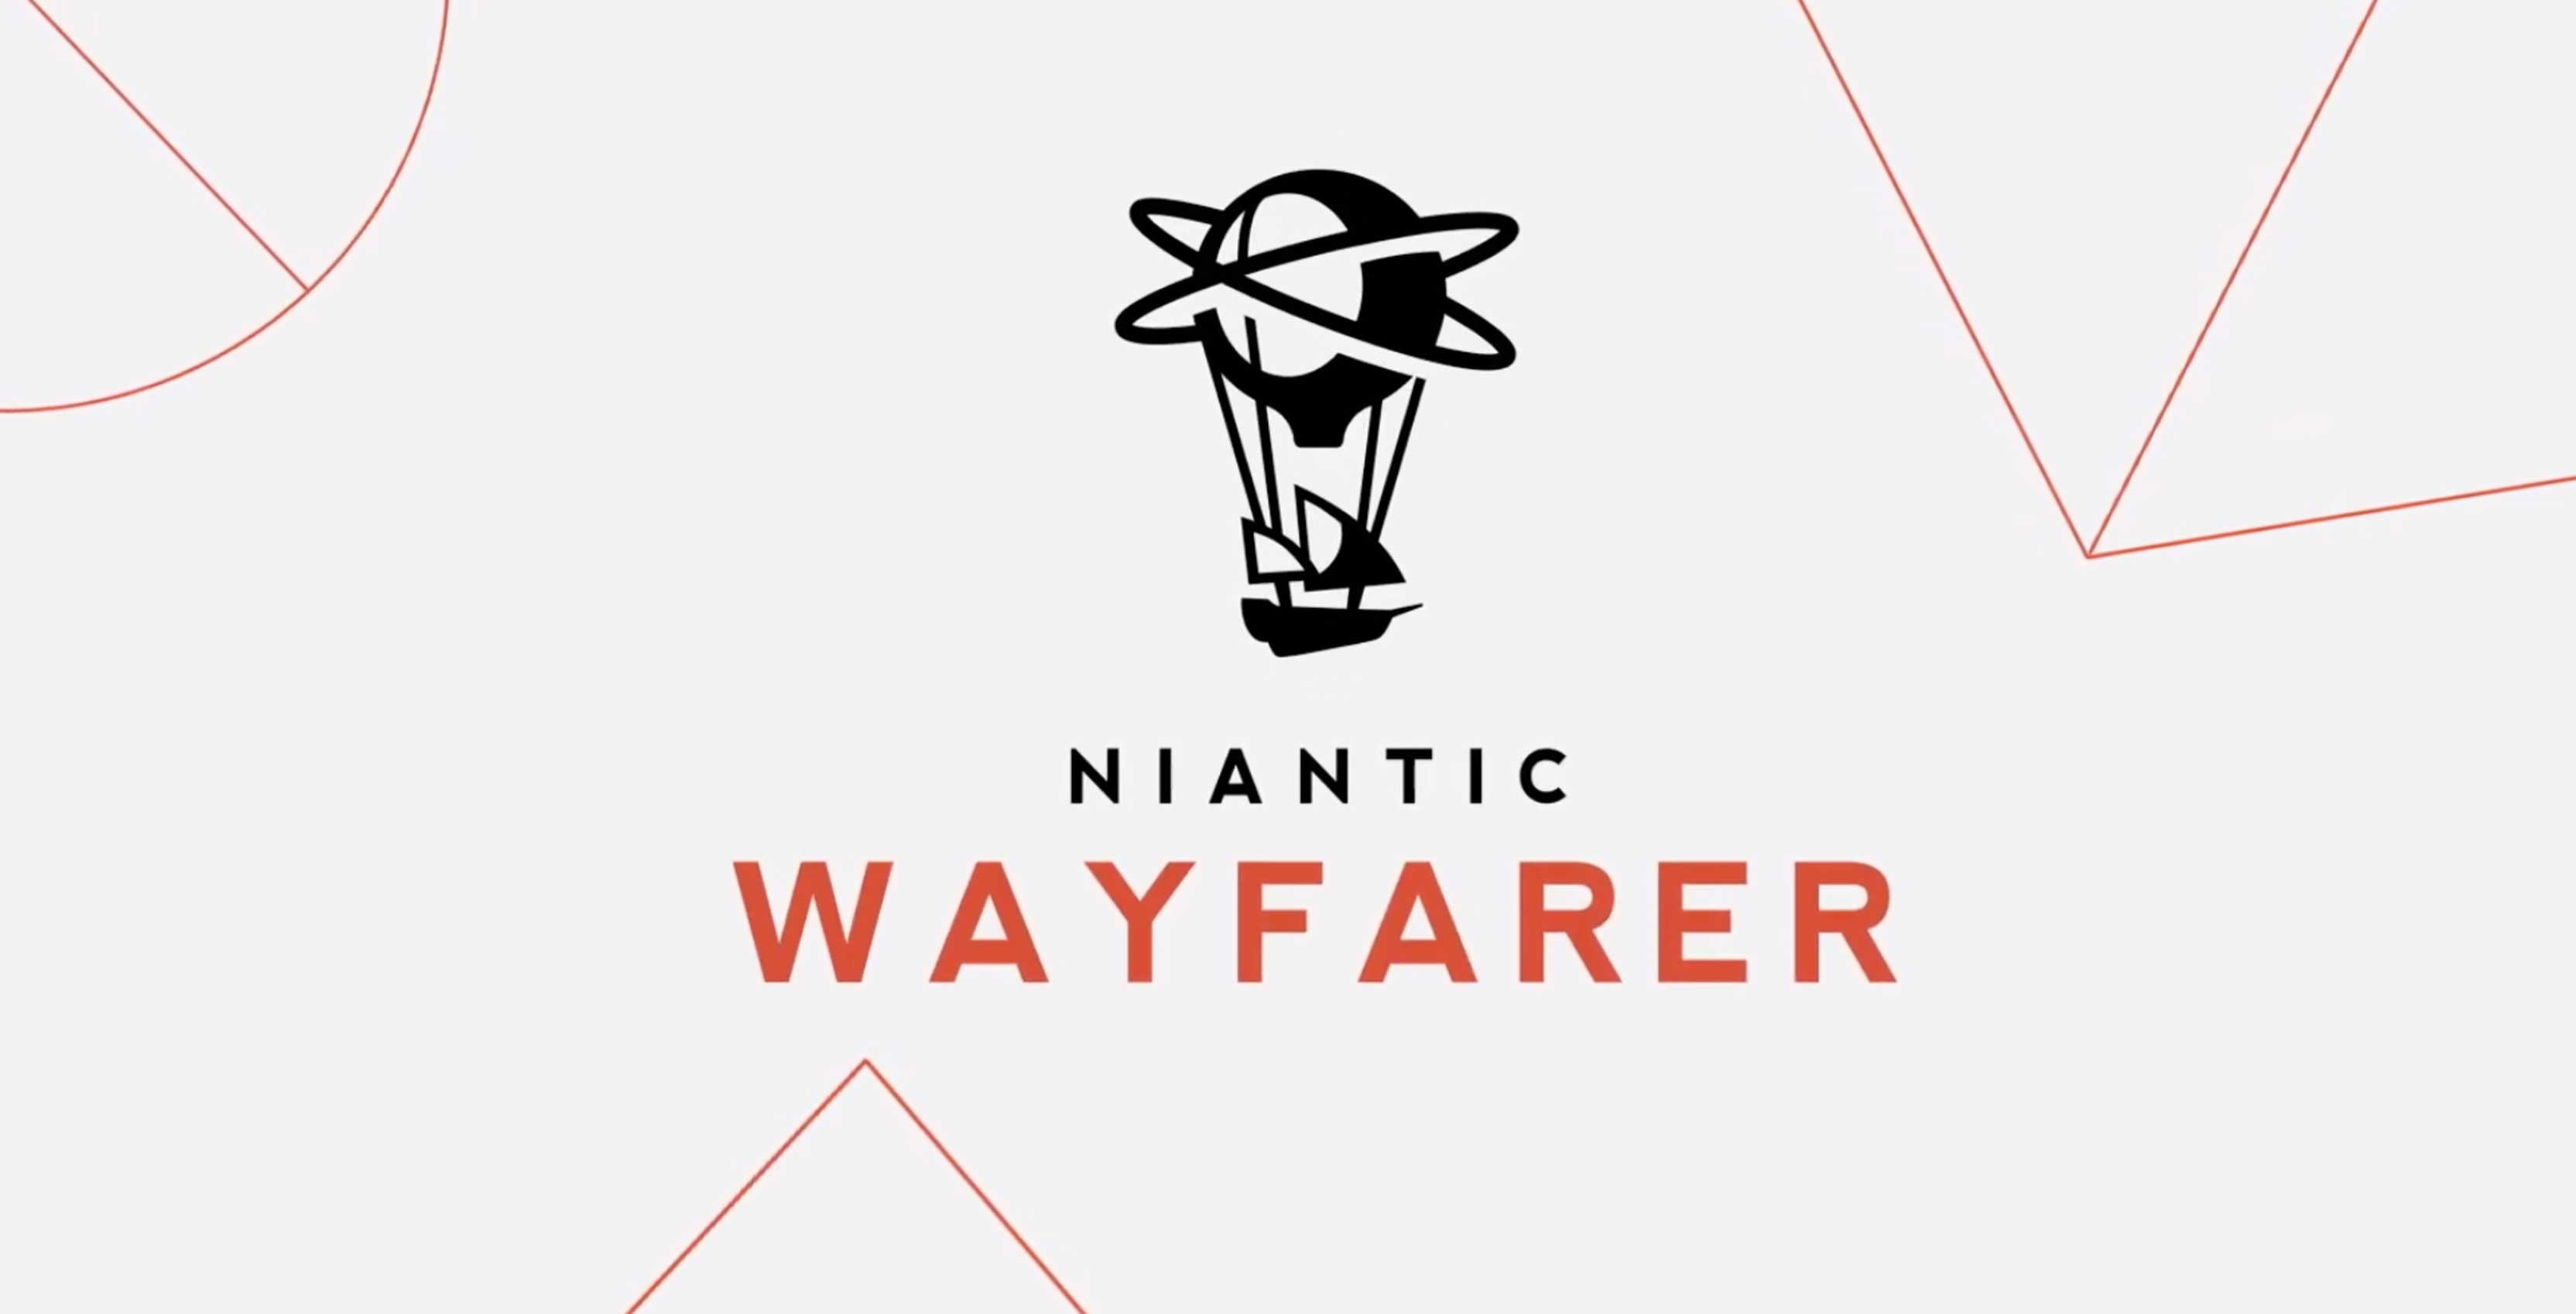 Niantic launches Wayfarer program to create PokéStops and Gyms in Pokémon Go